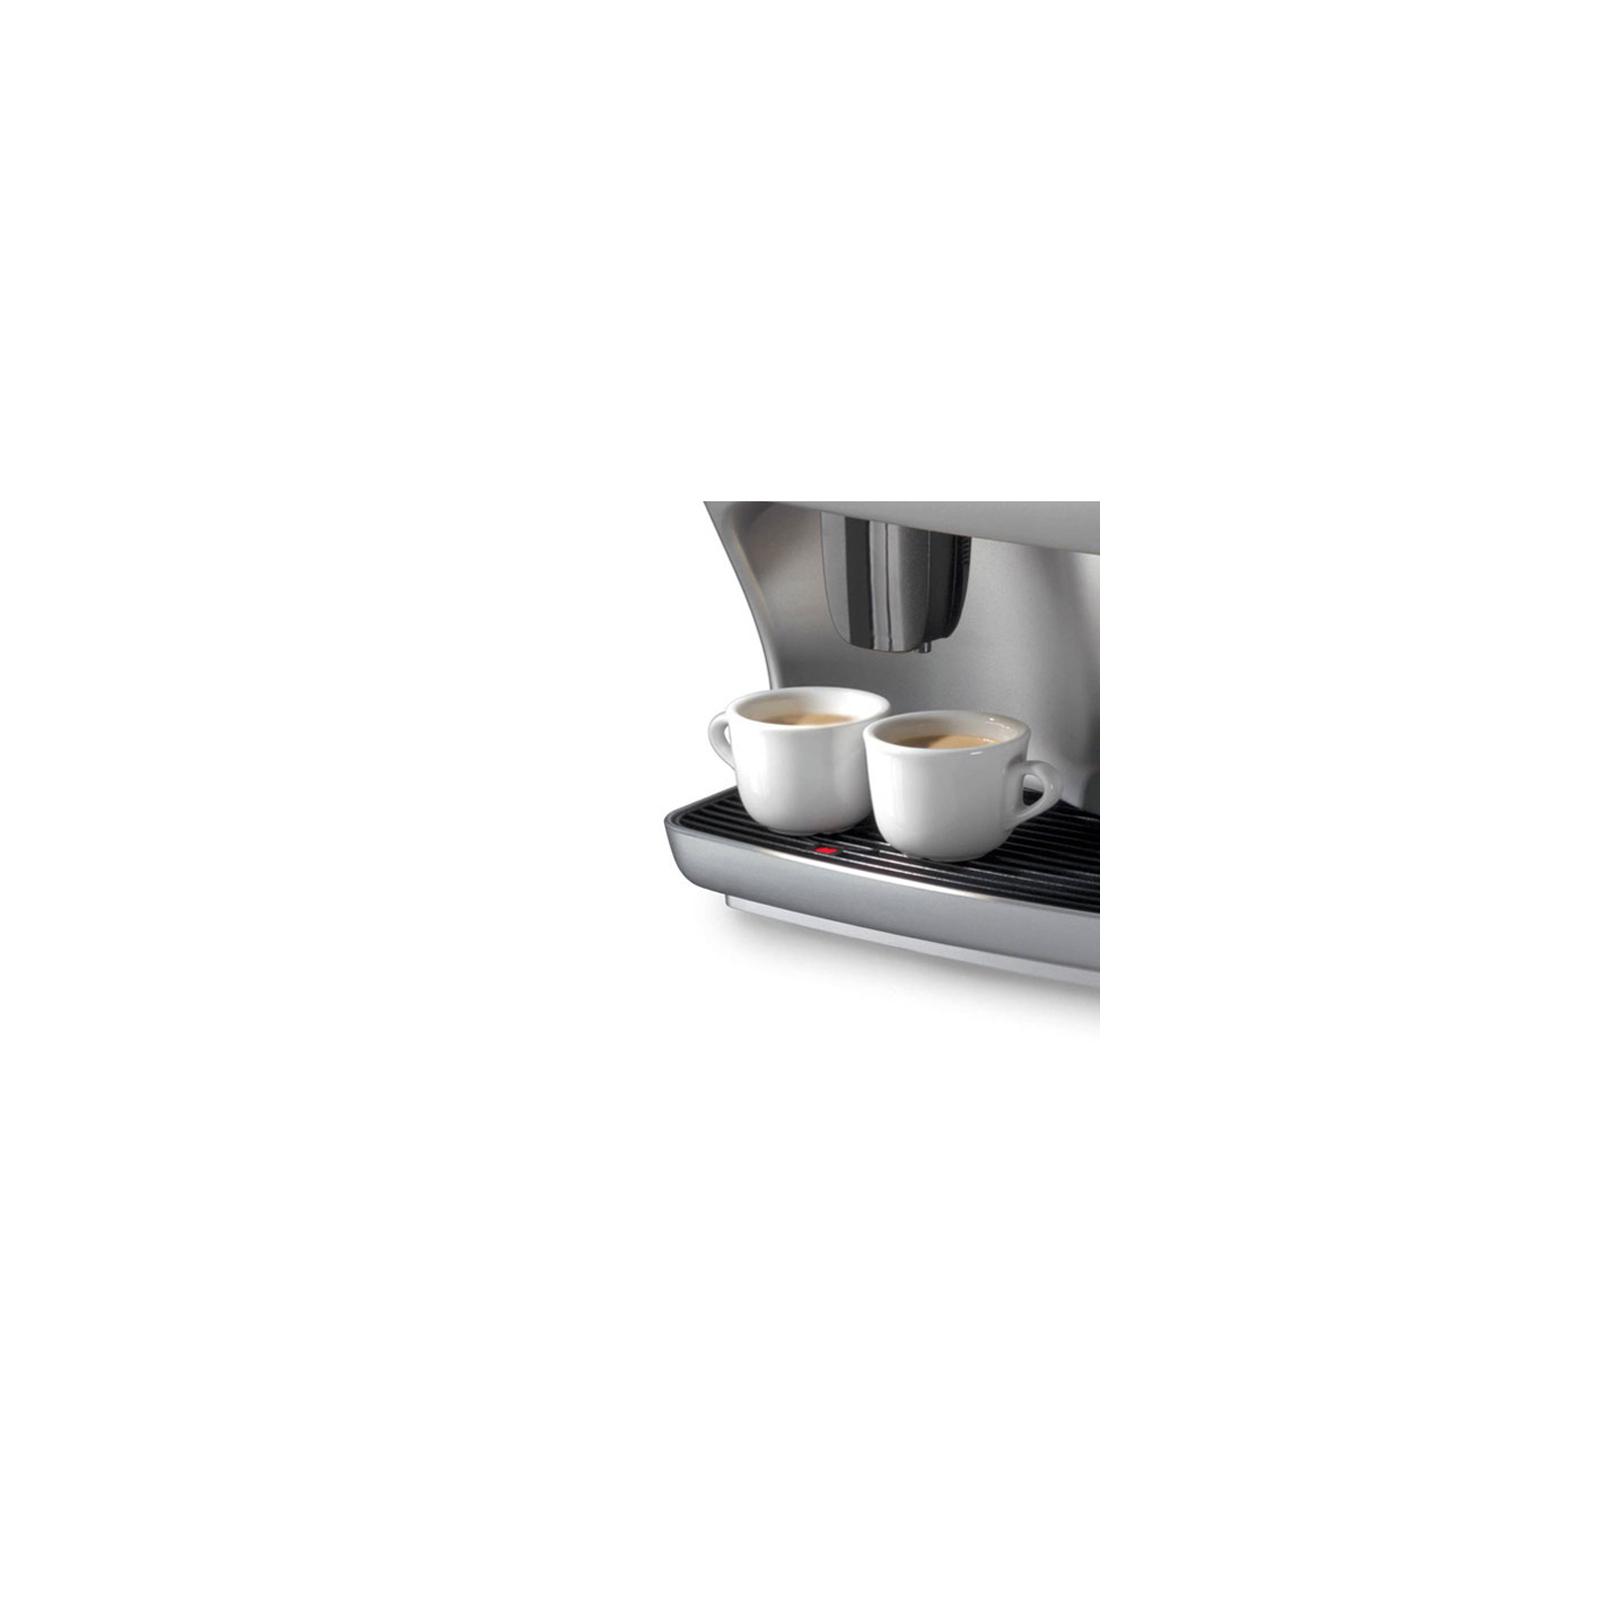 Кофеварка Gaggia Syncrony Logic RS Cappuccino изображение 3